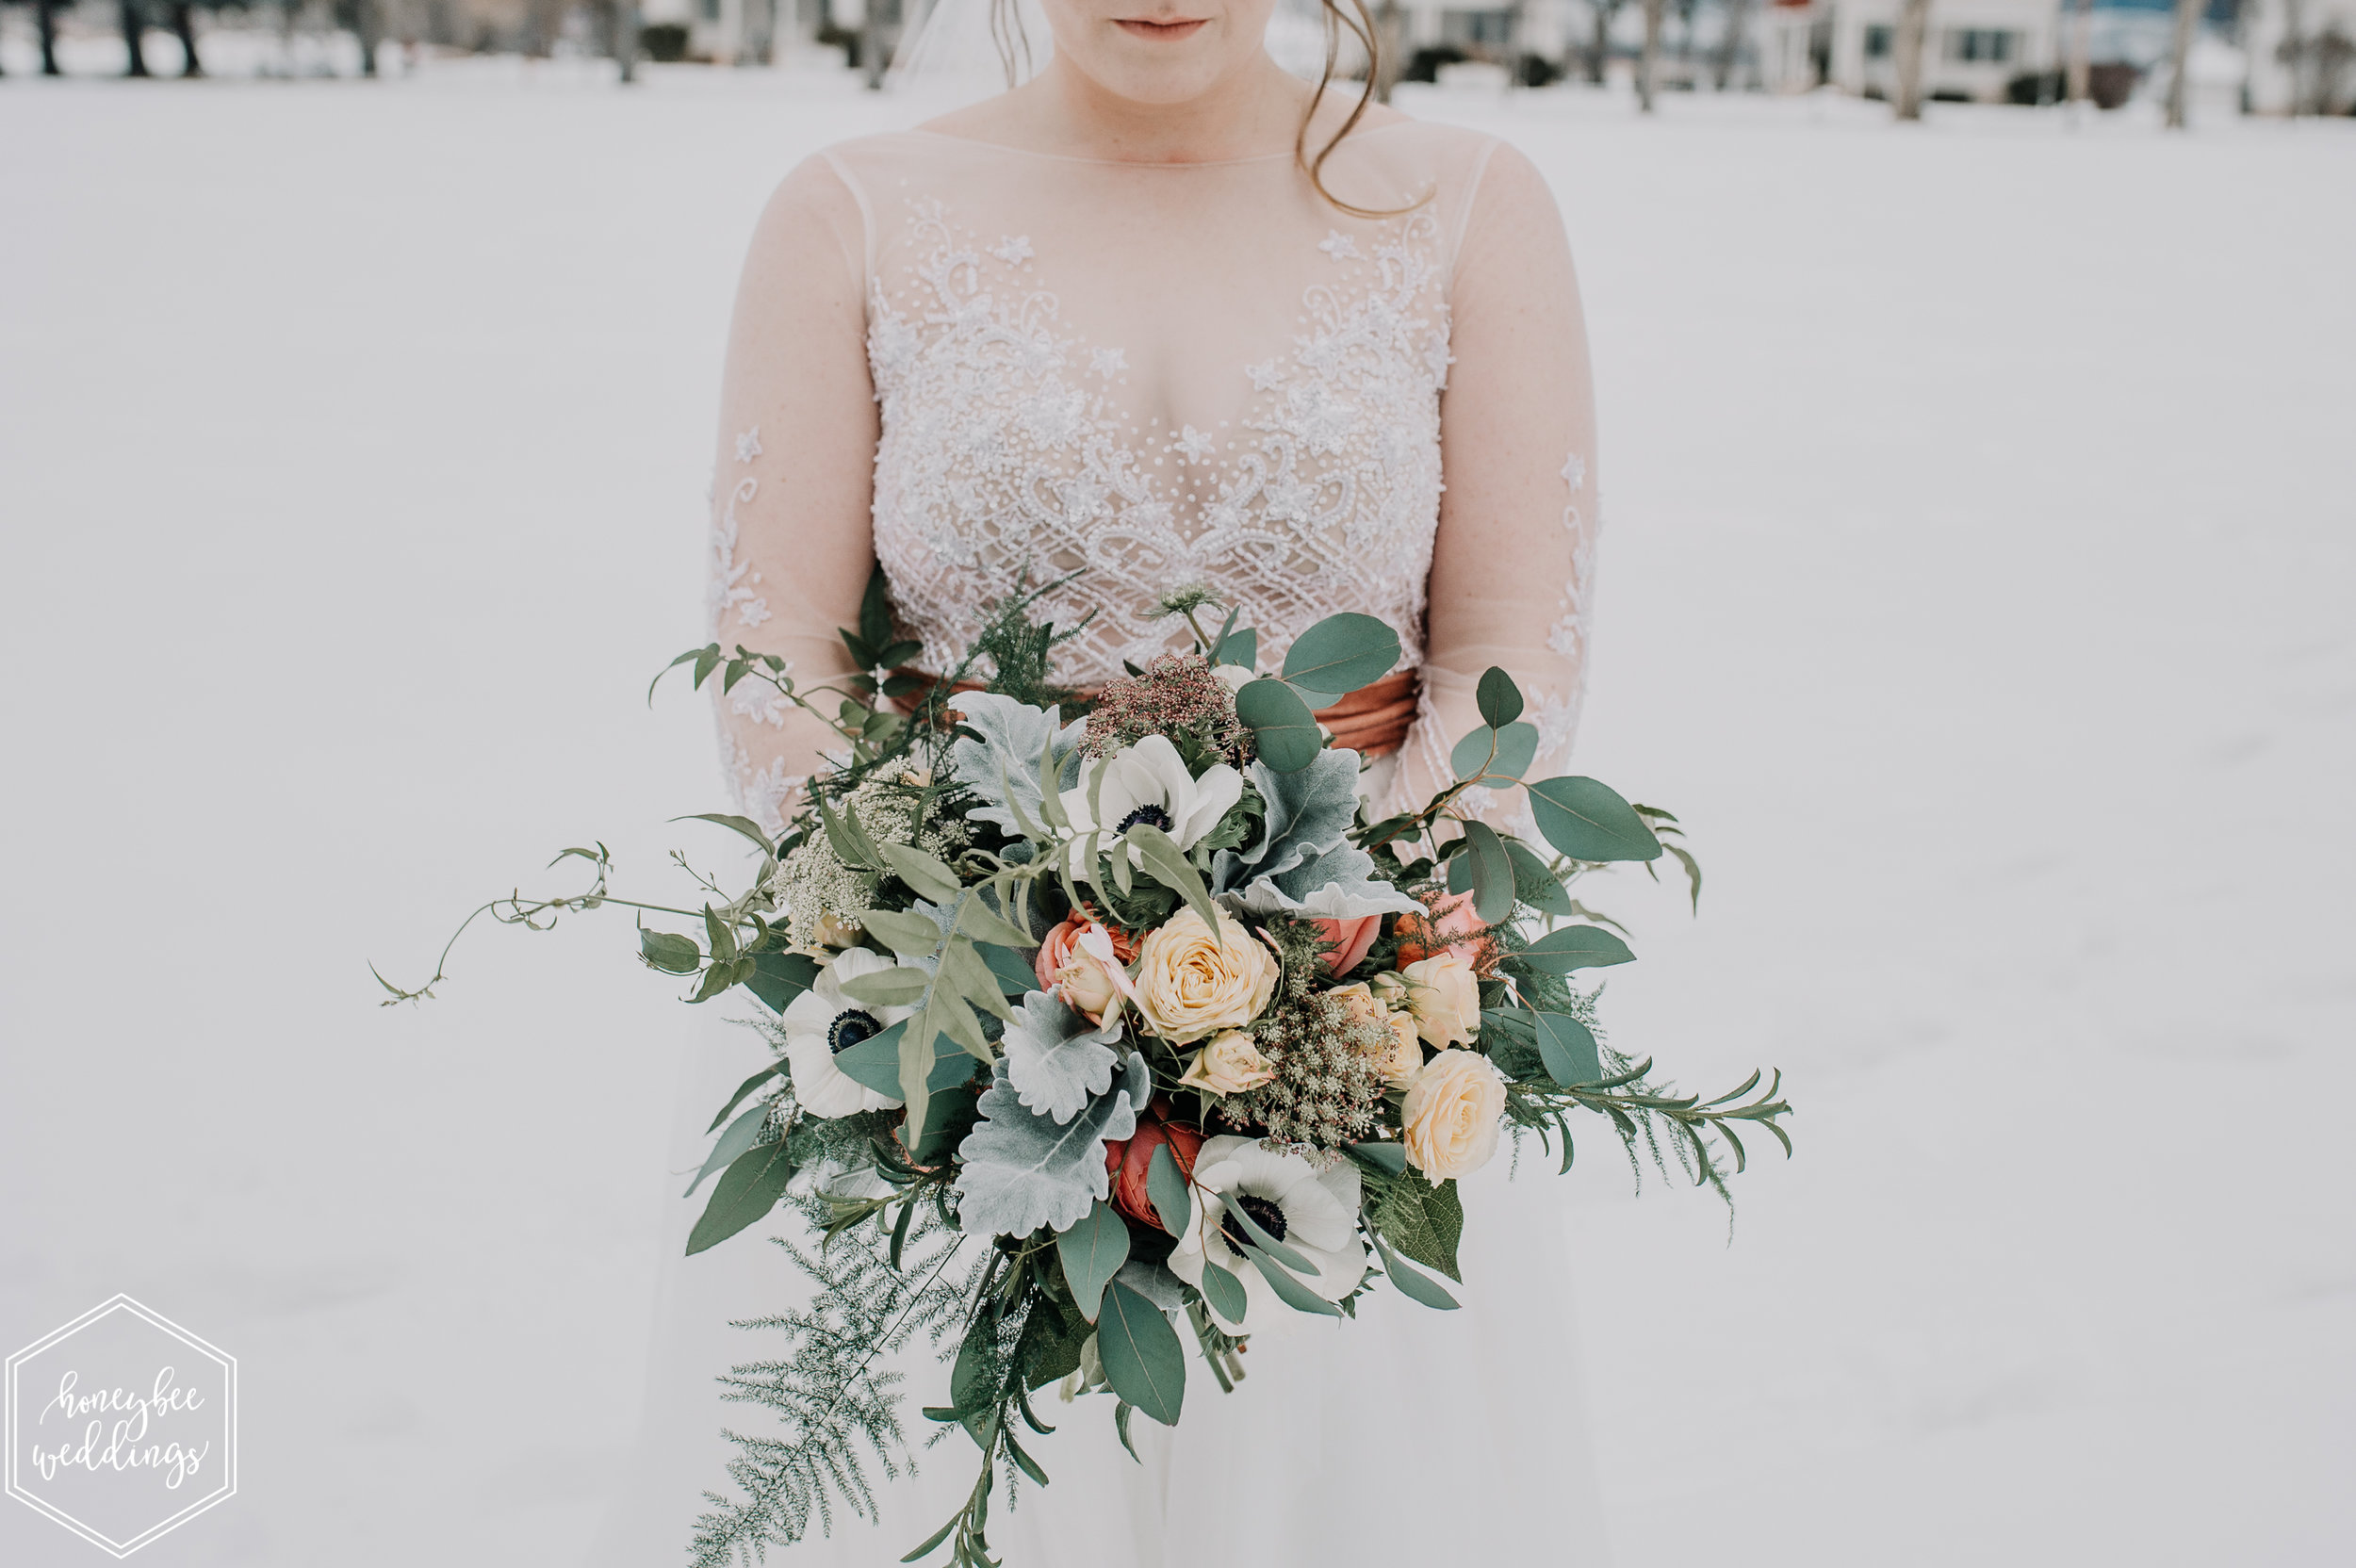 0171Montana Wedding Photographer_Montana winter wedding_Wedding at Fort Missoula_Meri & Carter_January 19, 2018-367.jpg